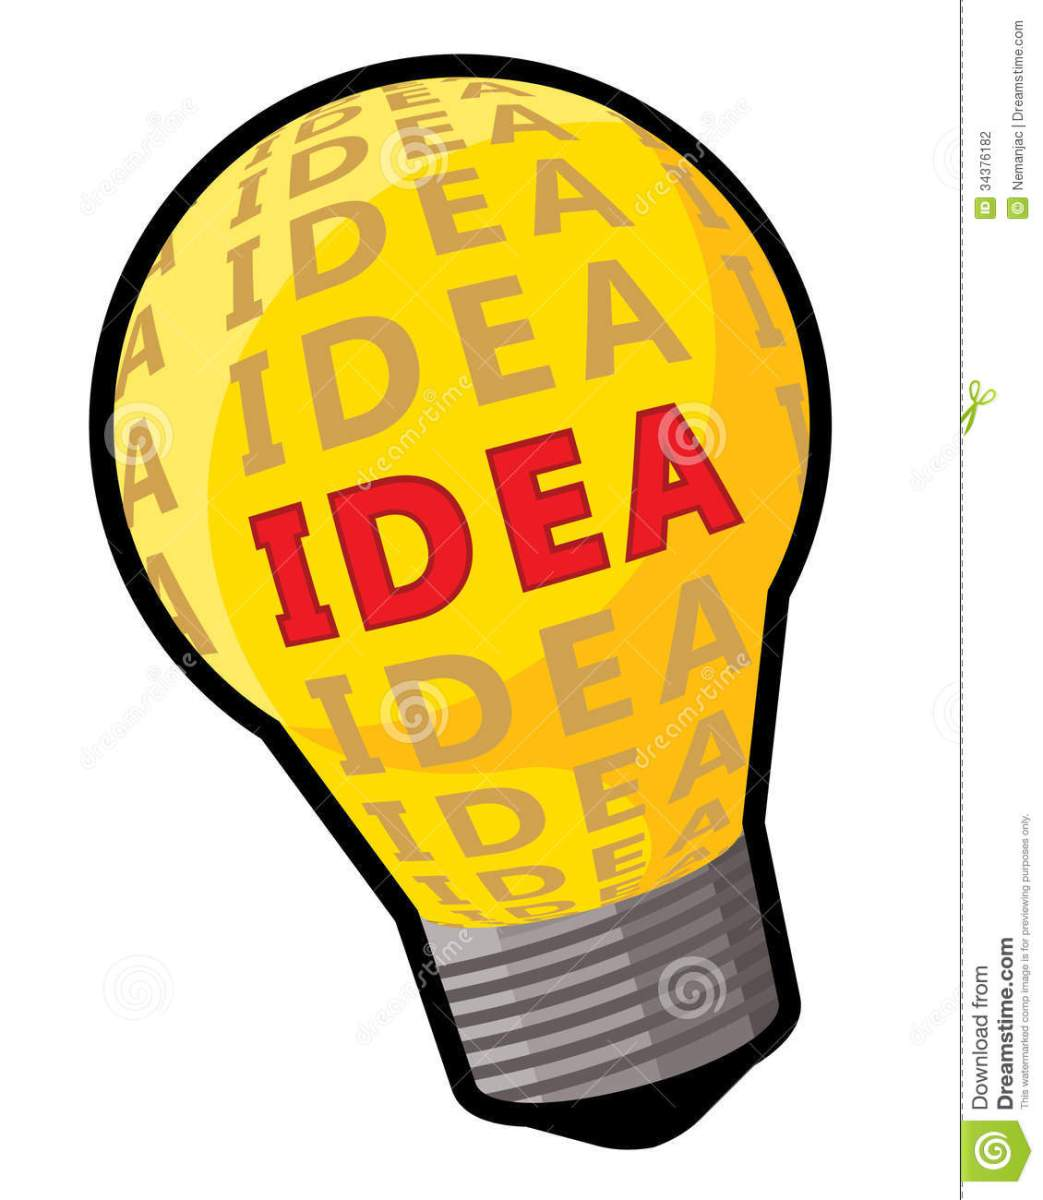 Lamps clipart thinker Art clip light bulb thinking